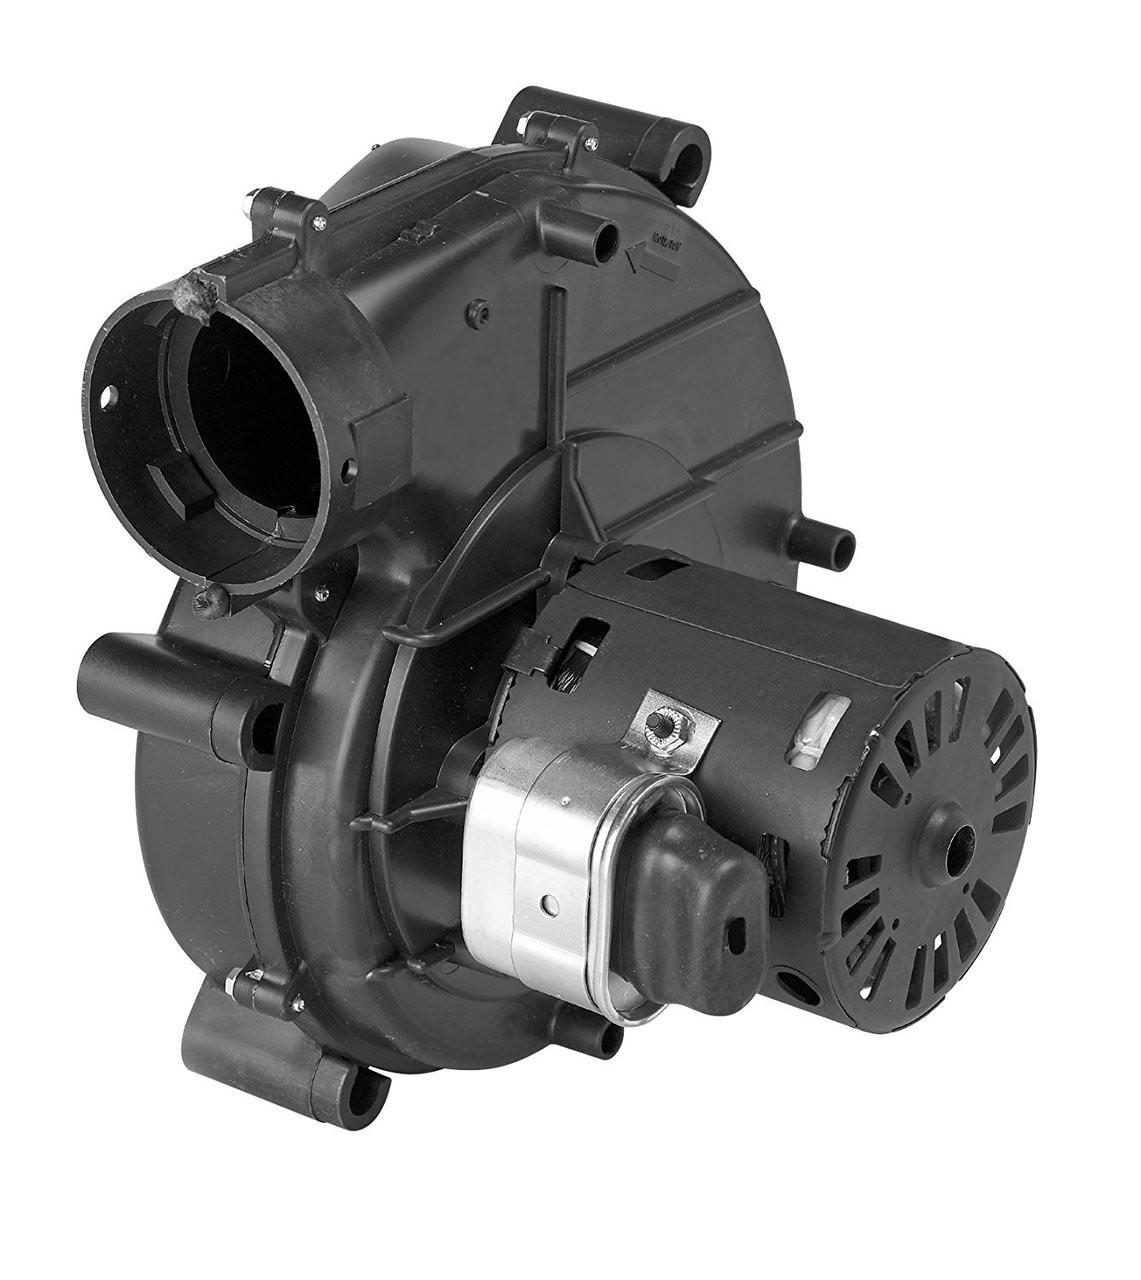 medium resolution of york ducane furnace draft inducer 7062 5019 7062 3136 115v fasco a168